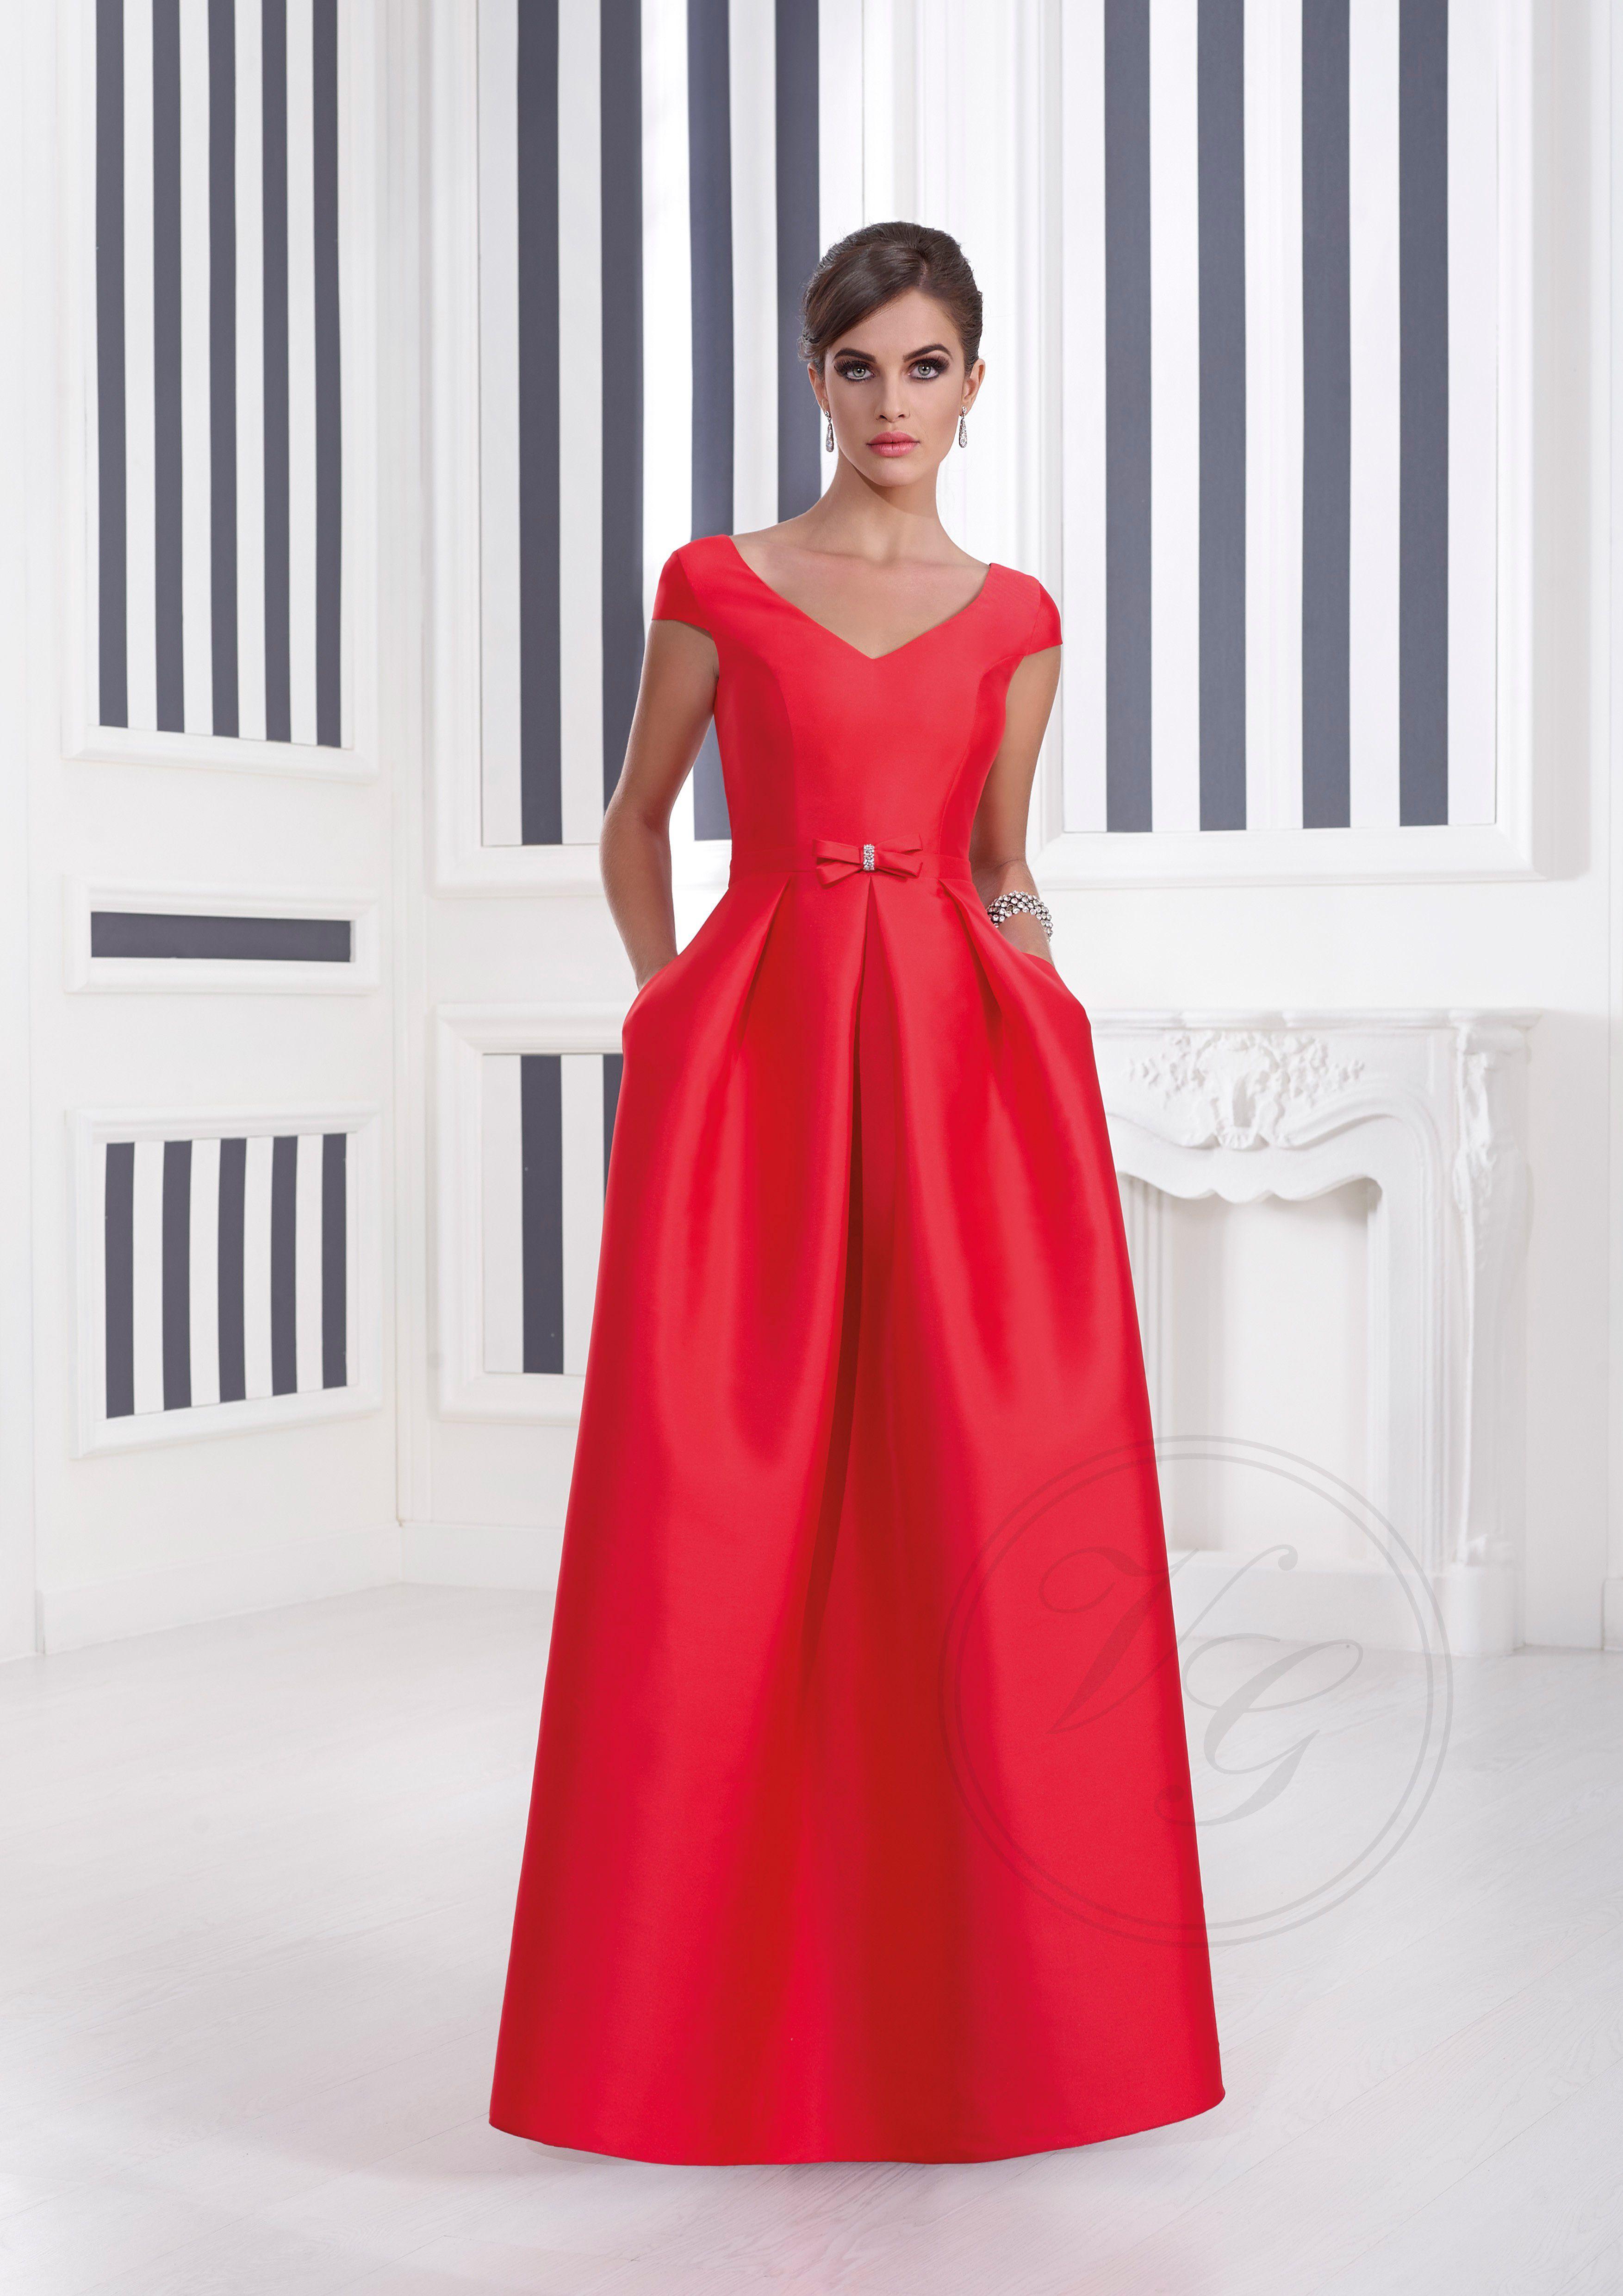 Pin by elena kozhieva on Платья pinterest outfits vestidos and